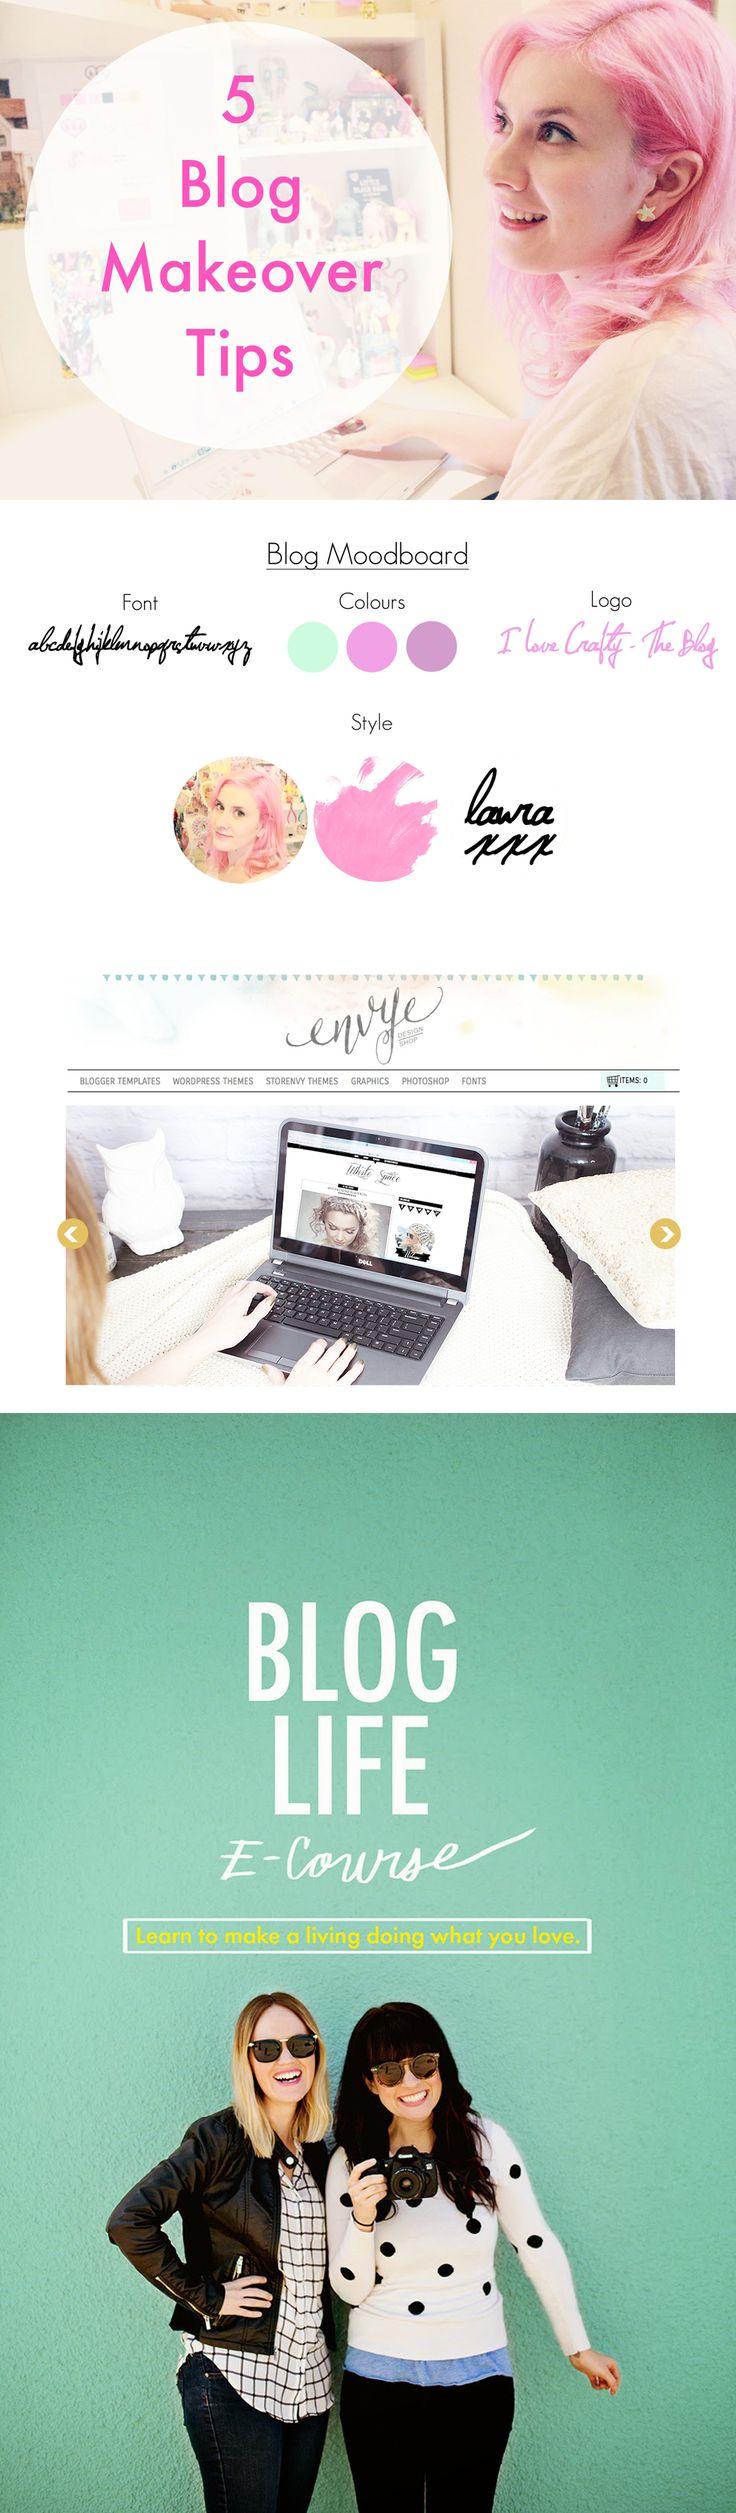 Blog design tips by I Love Crafty